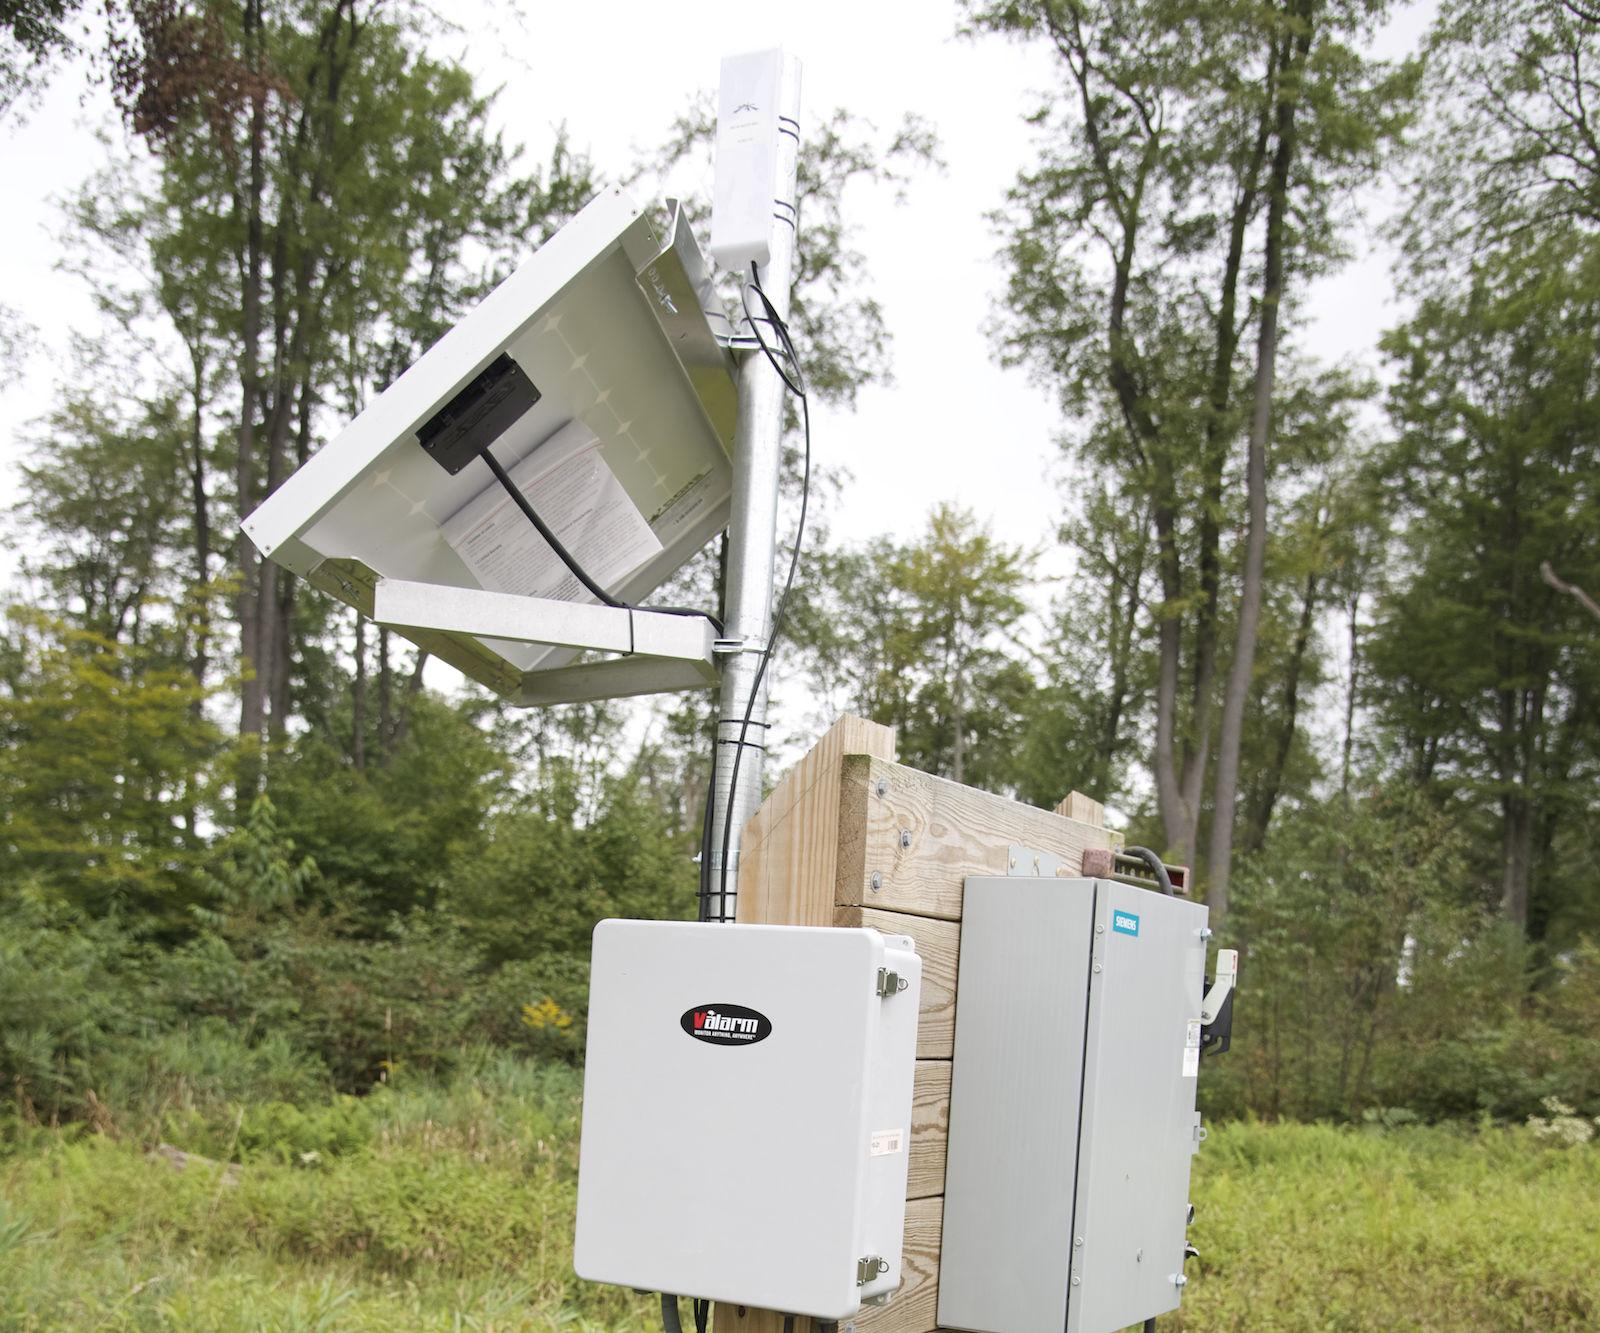 Industrial IoT Applications - Remote Temperature Sensor Monitoring